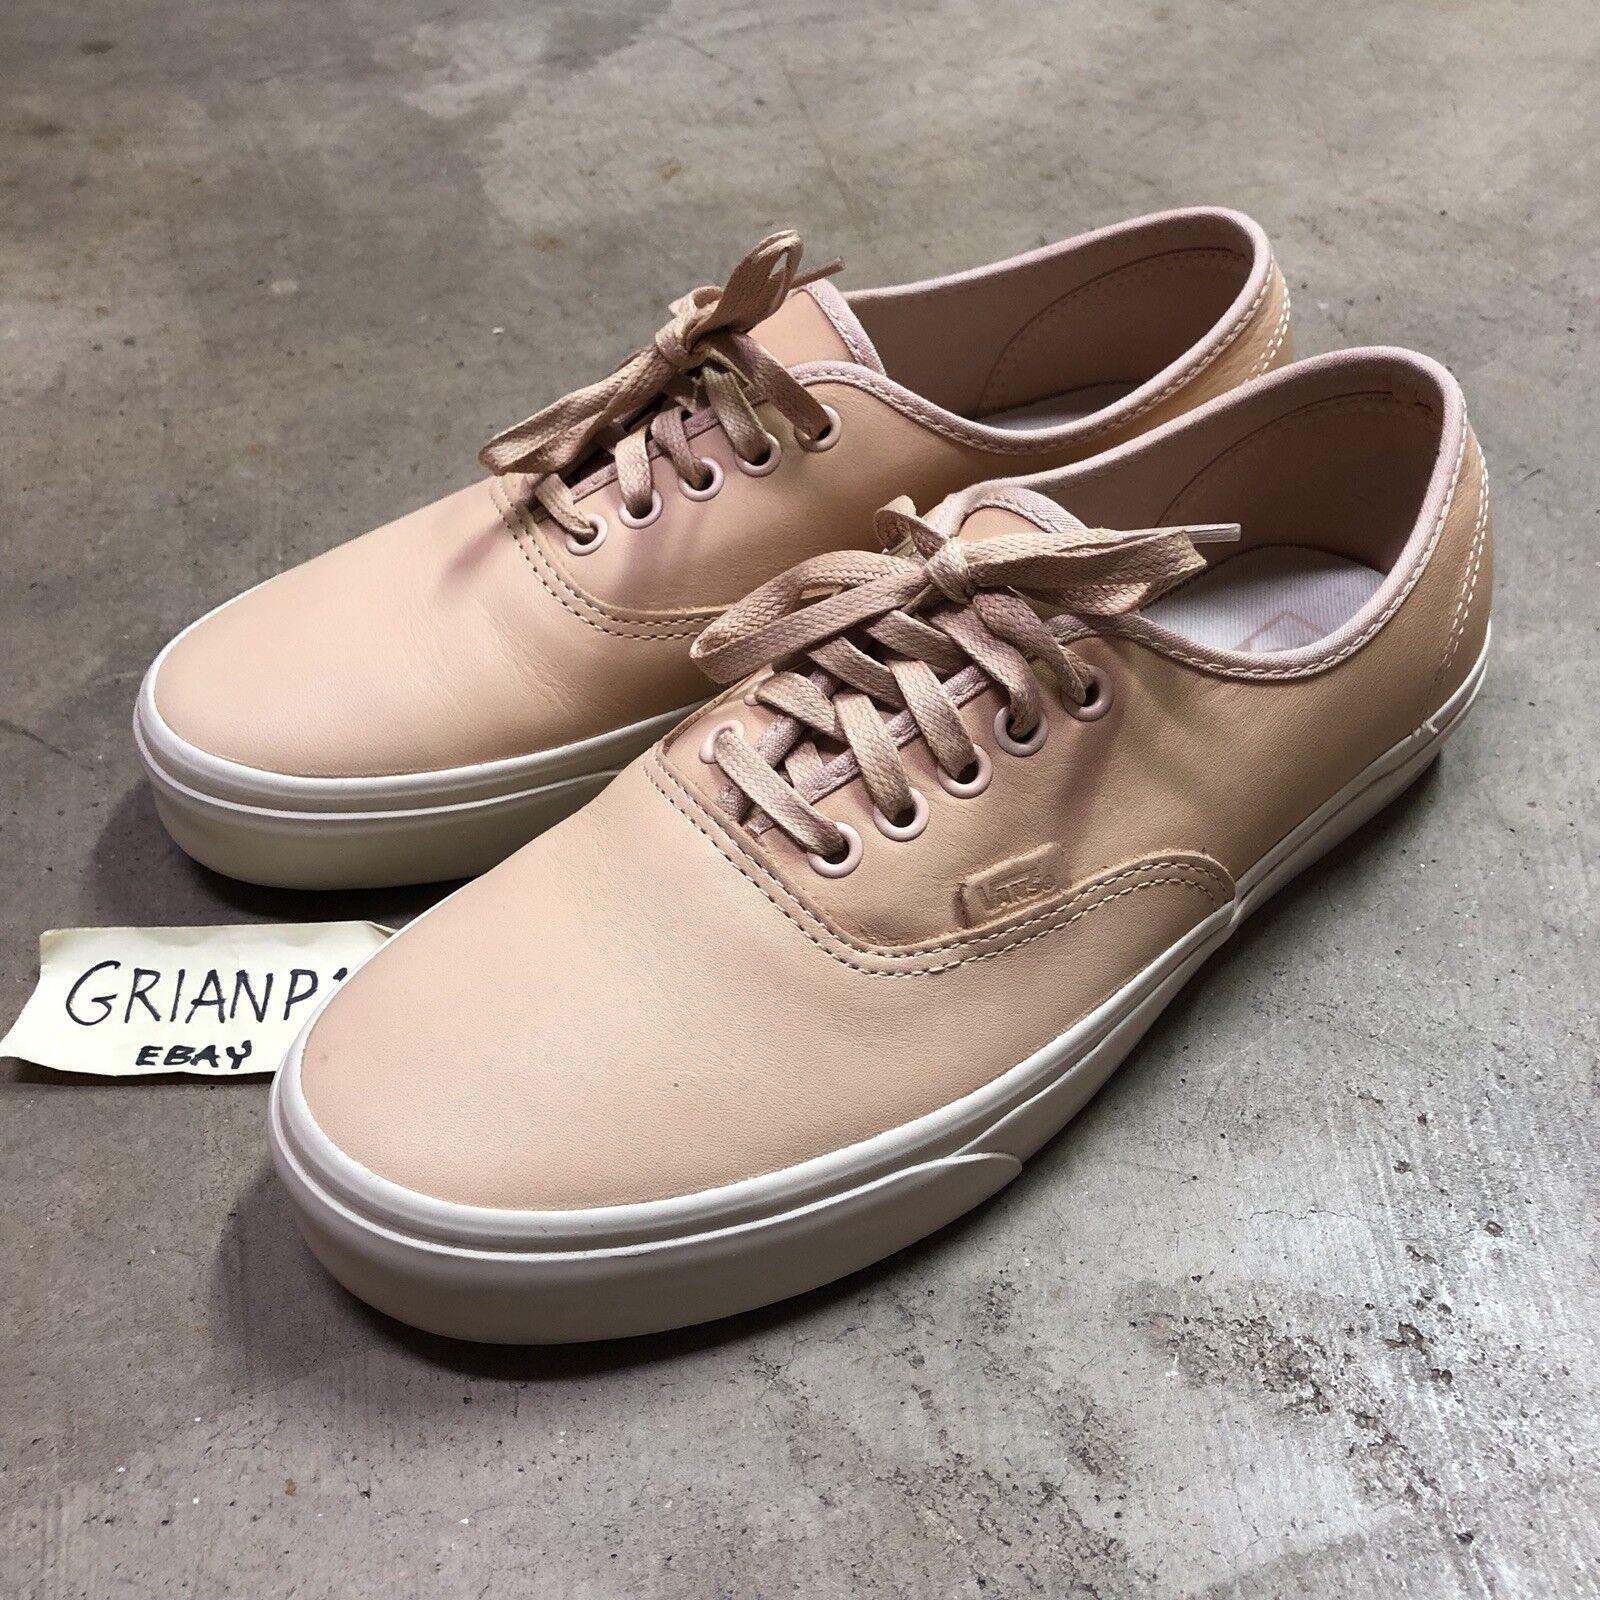 VANS Authentic DX Veggie Tan Leather shoes Mens Size 10 Worn Once FOG